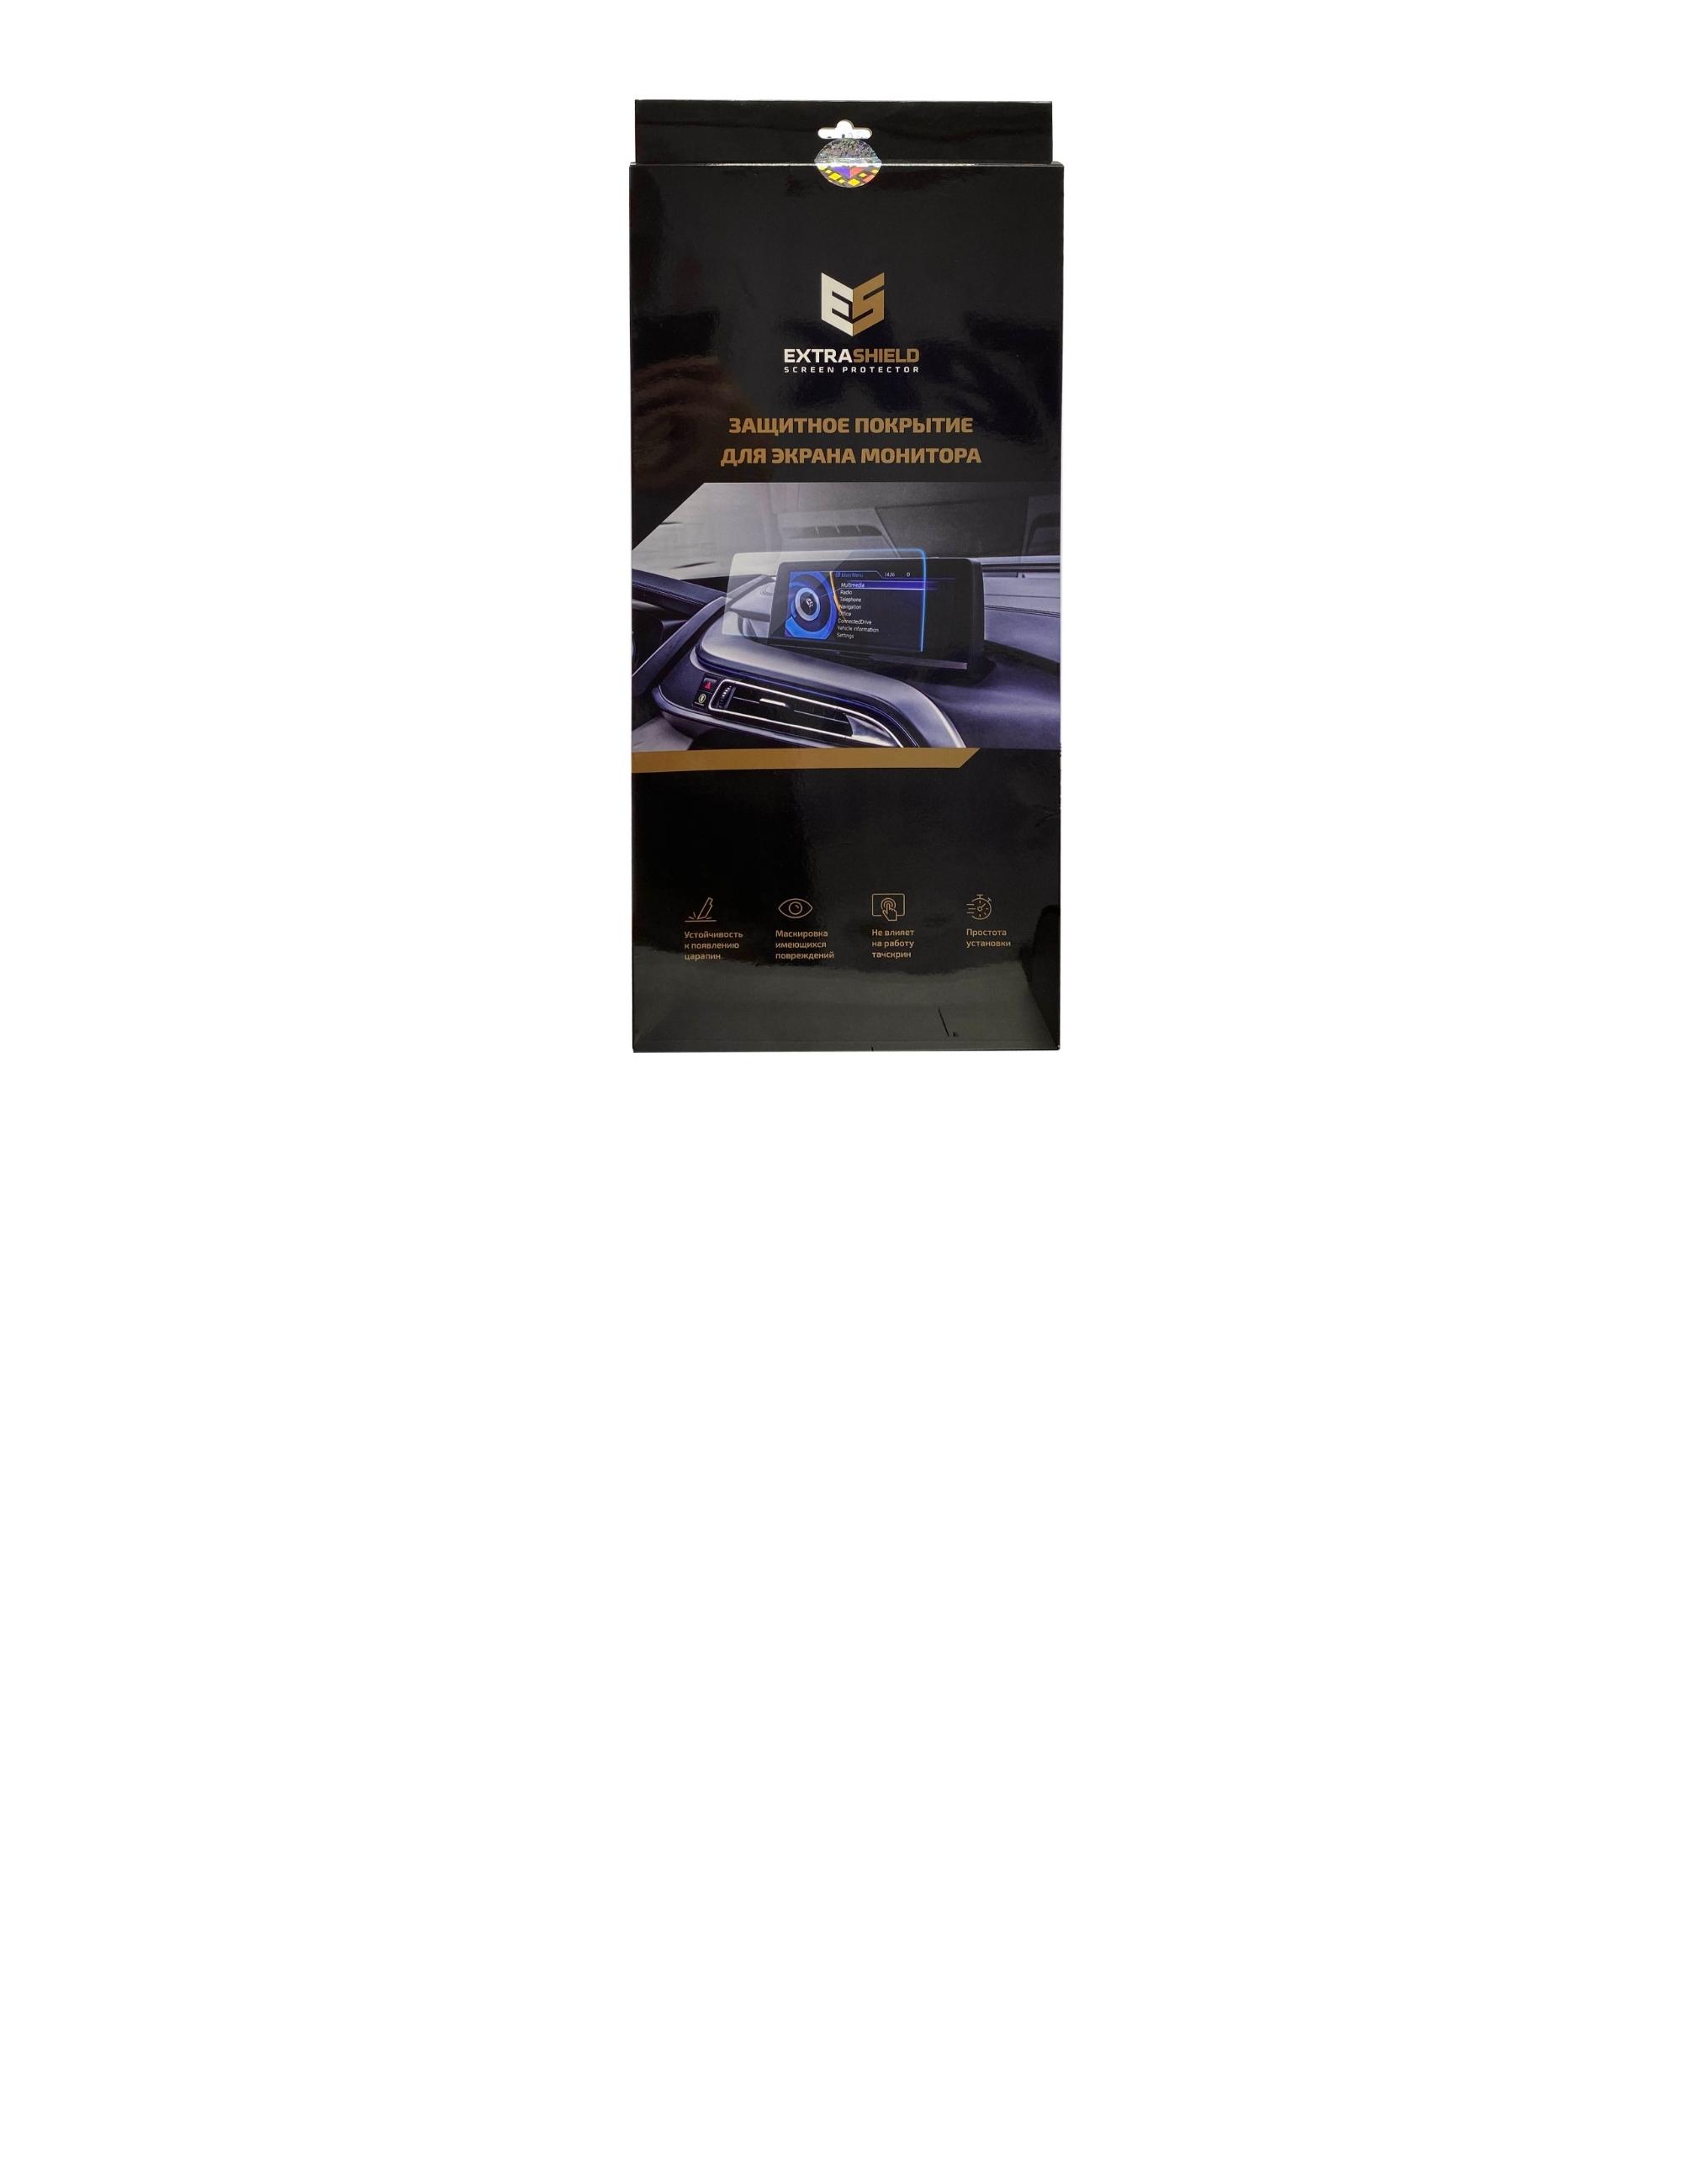 Mercedes-Benz GL (X166) 2012 - 2015 мультимедиа 7 Защитное стекло Матовая